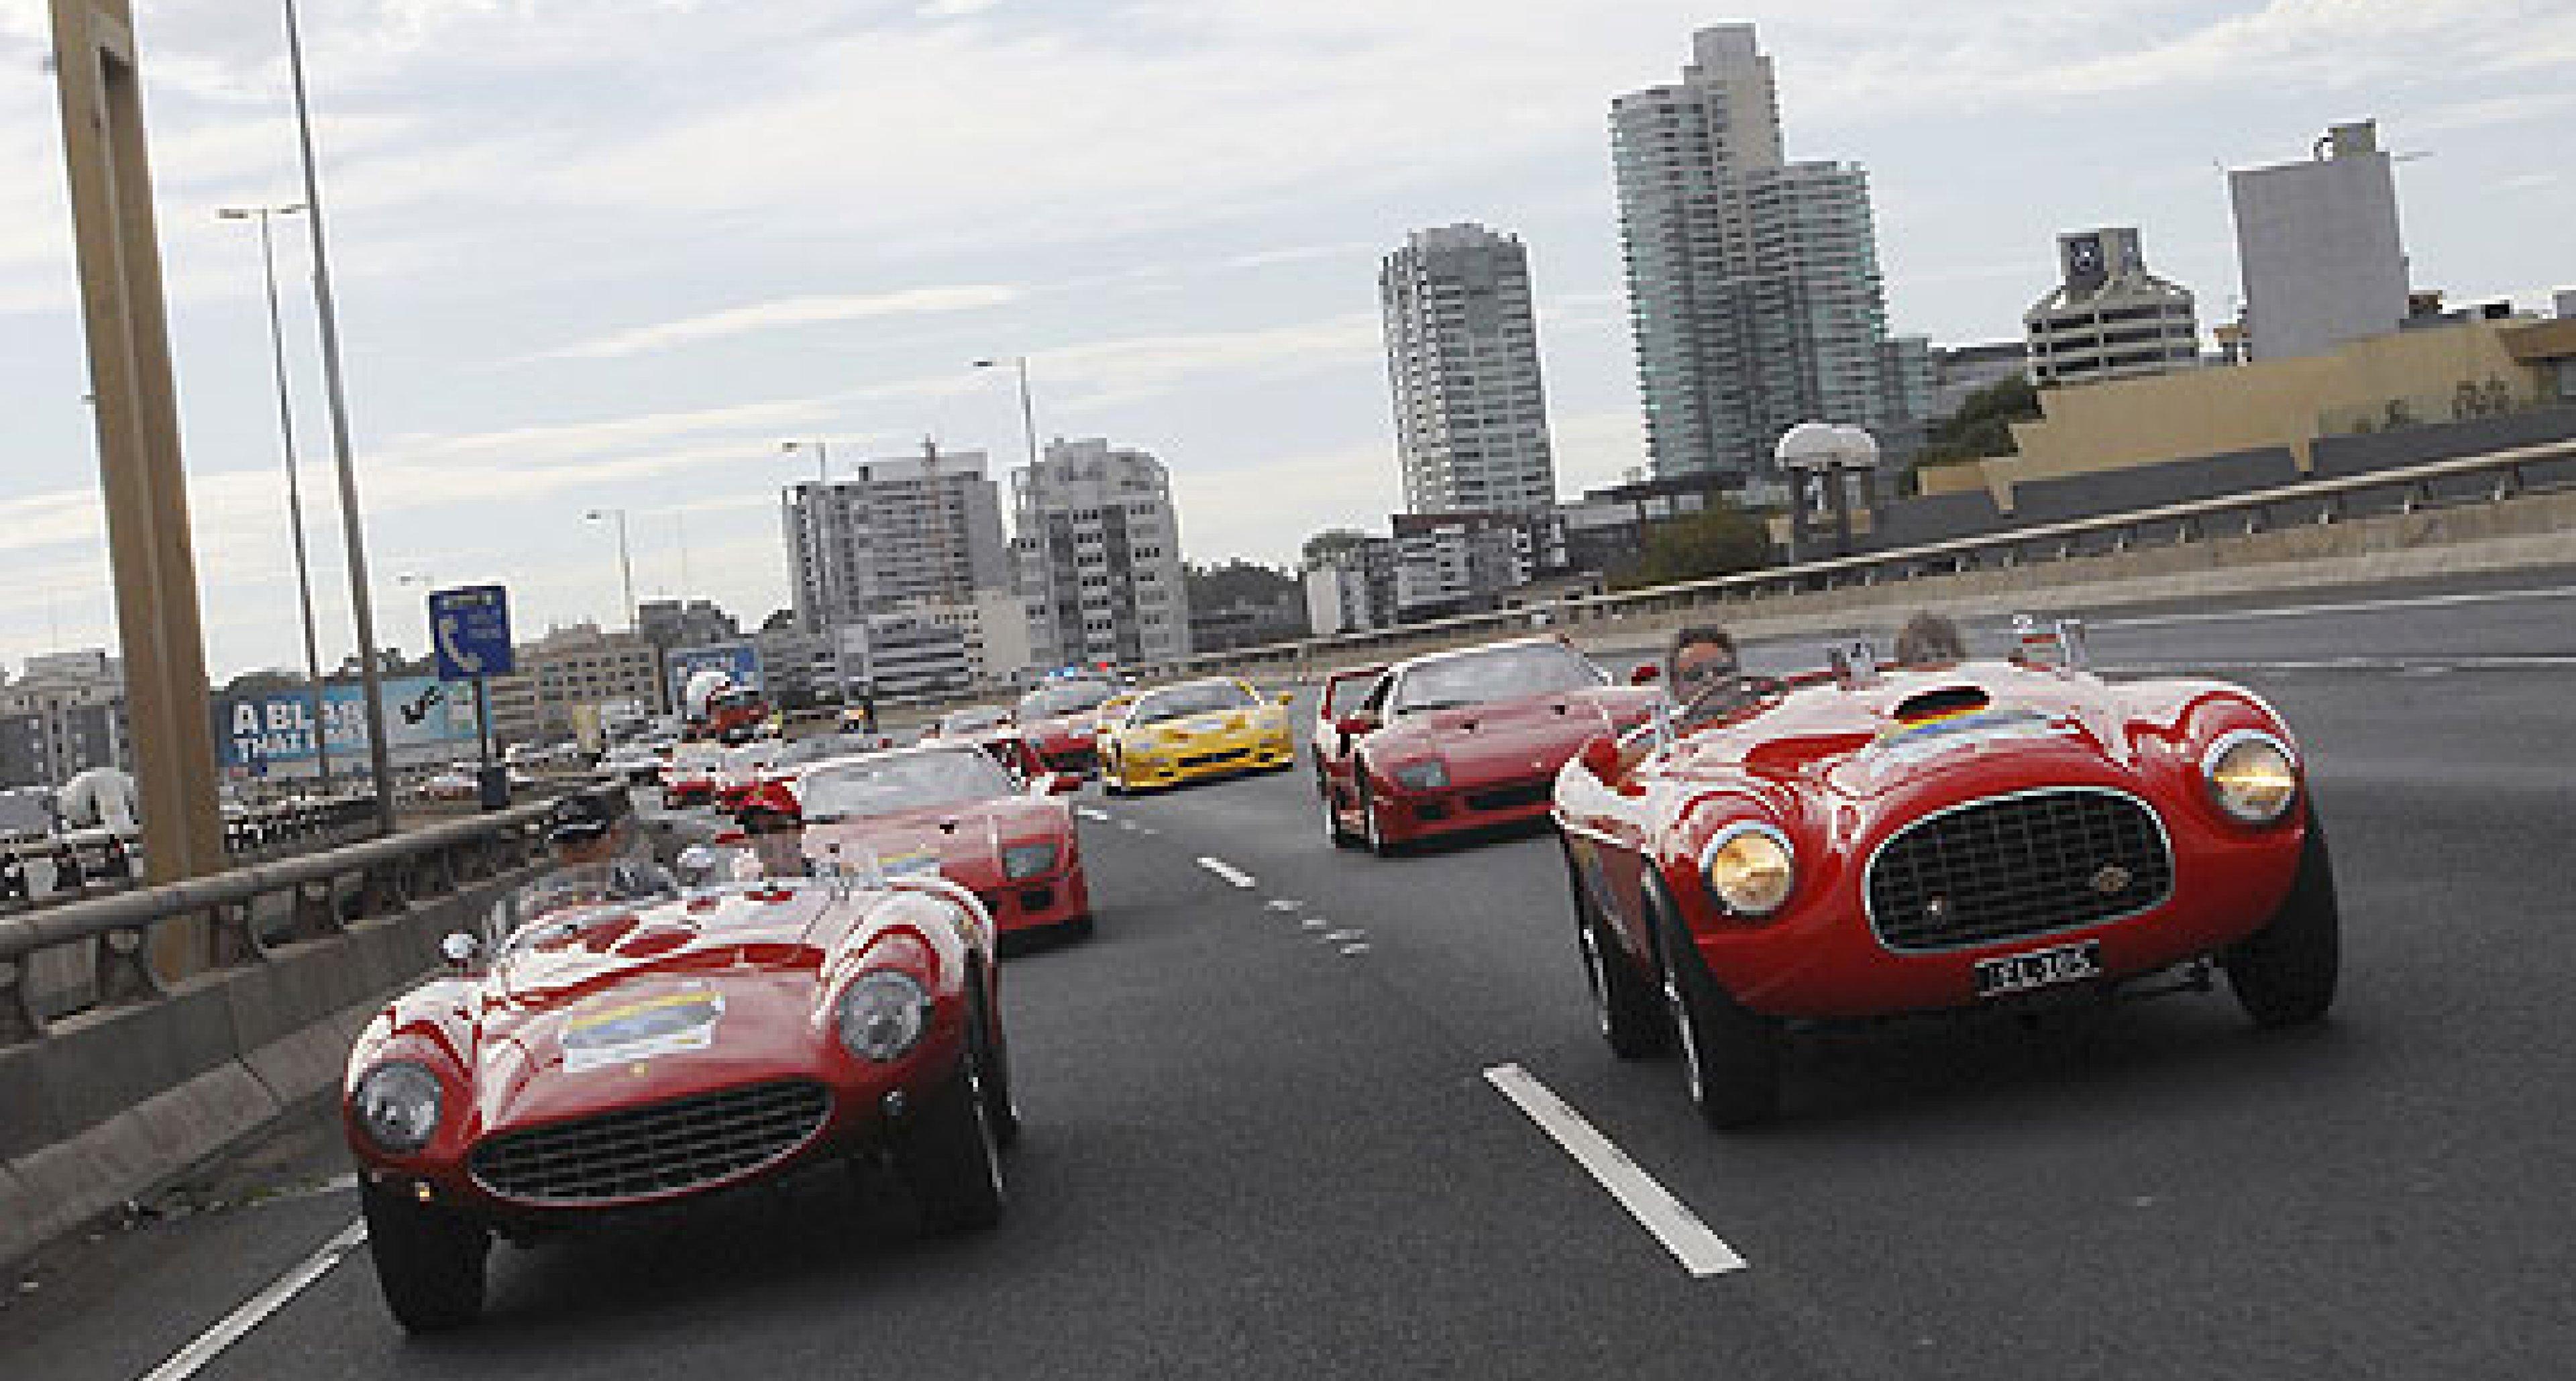 Progress of the Ferrari 60 Relay: